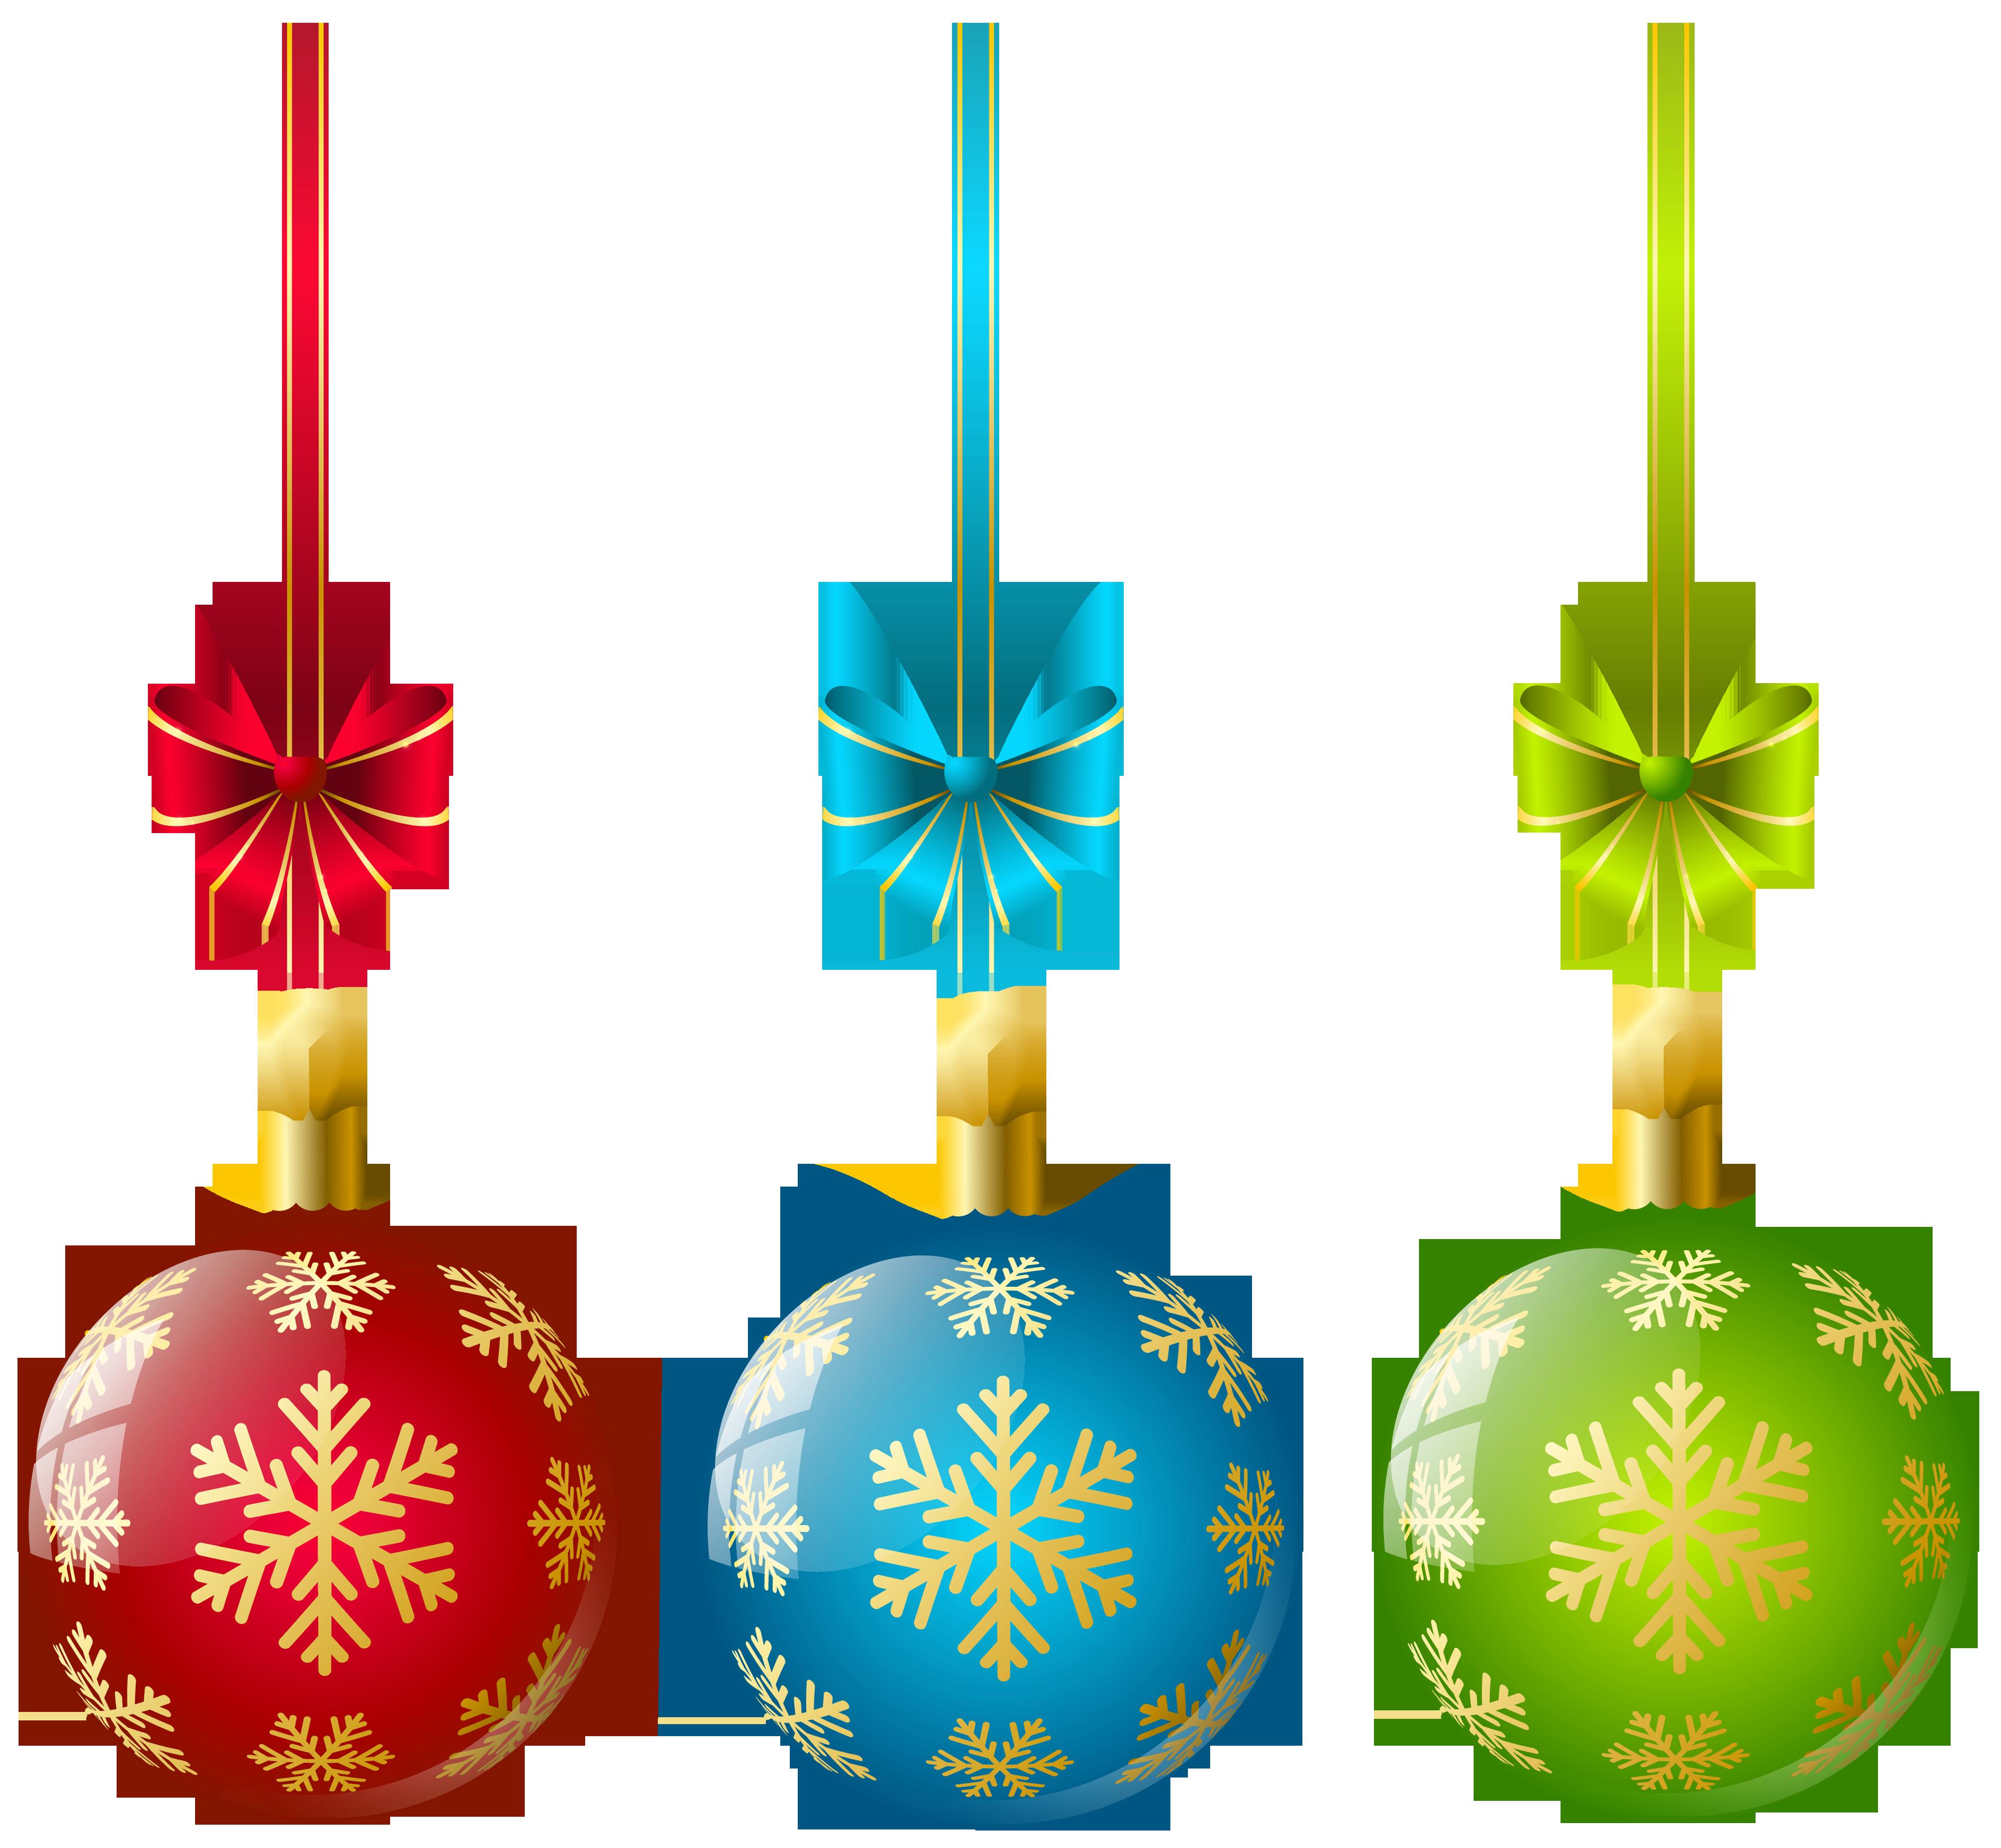 Christmas Ornament Sco clipart free image.